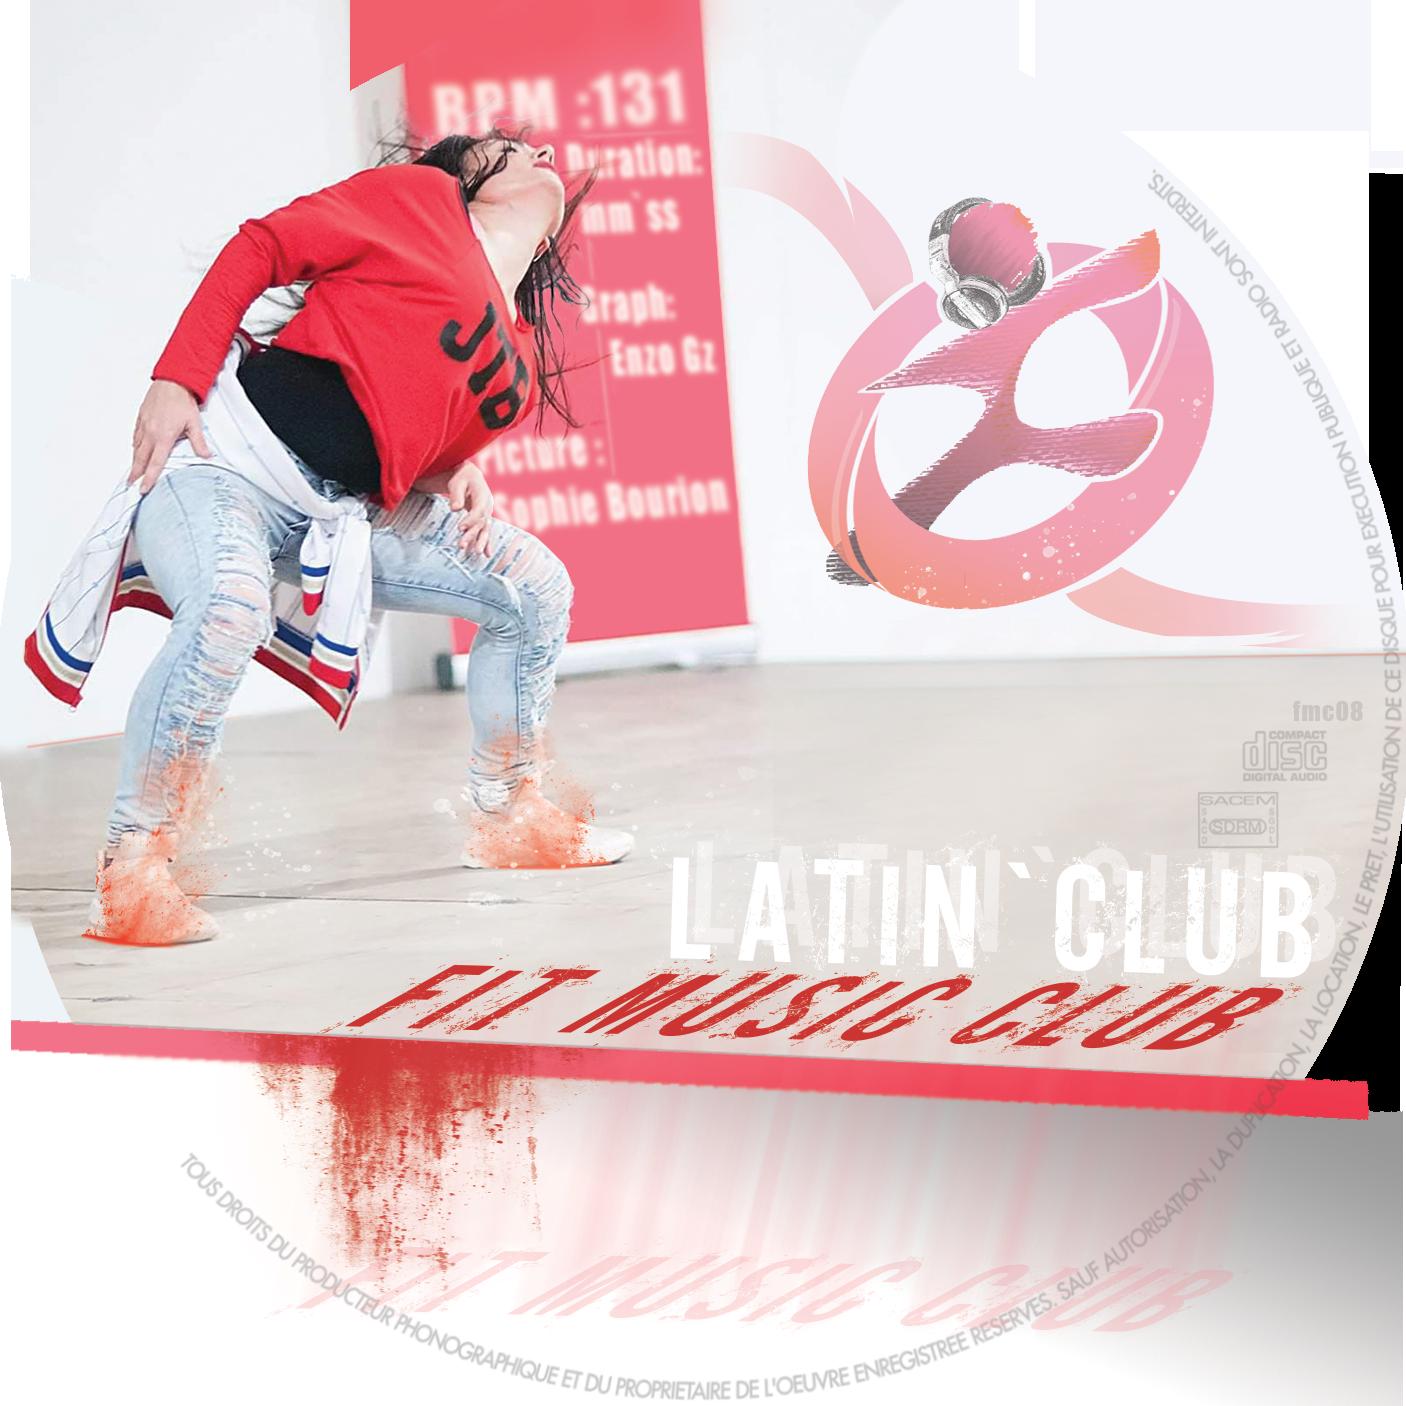 Latin' Club – CD